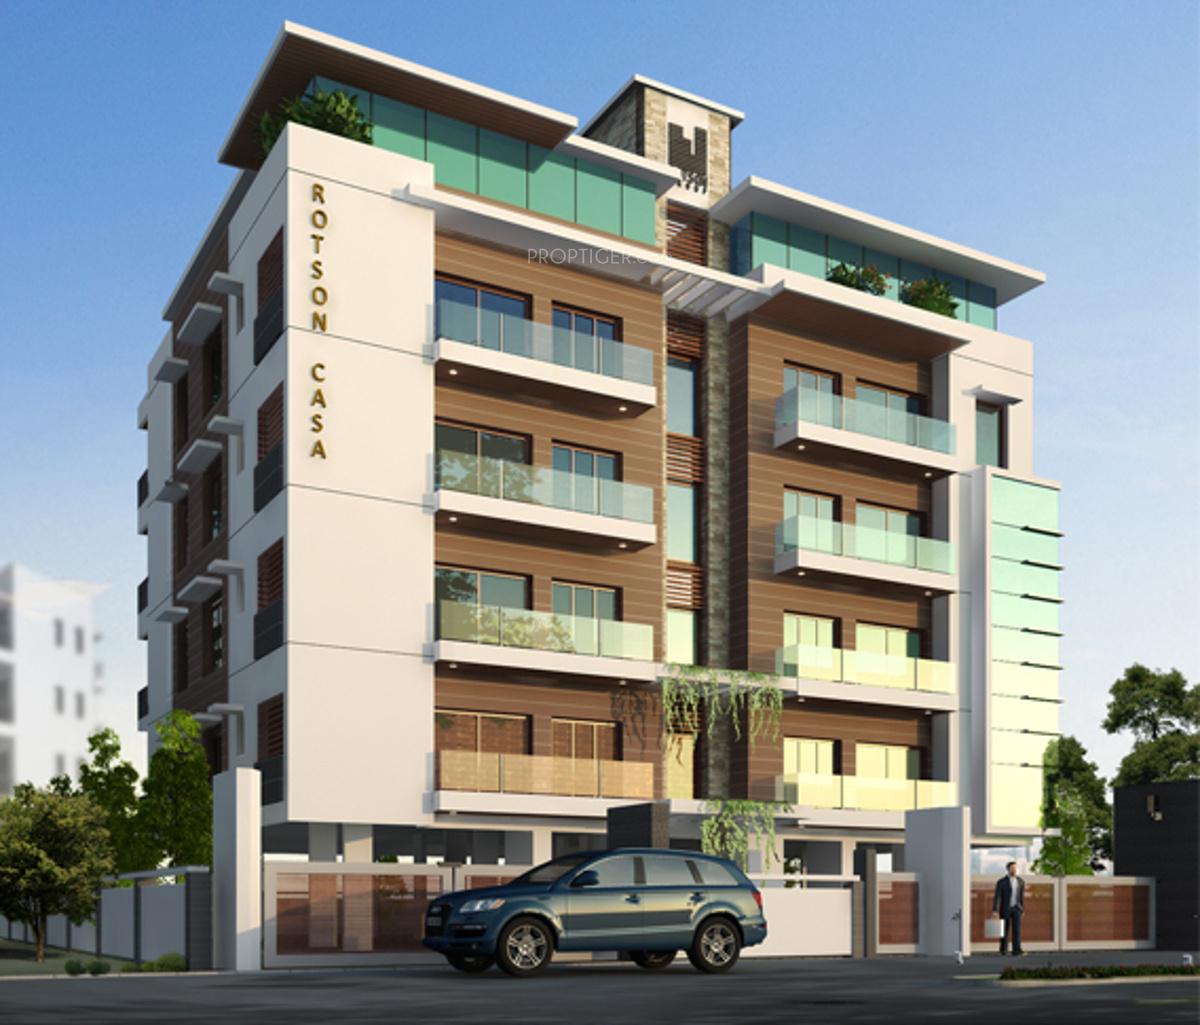 1219 sq ft 2 bhk floor plan image rotson casa available for Sq ft prezzo per costruire casa